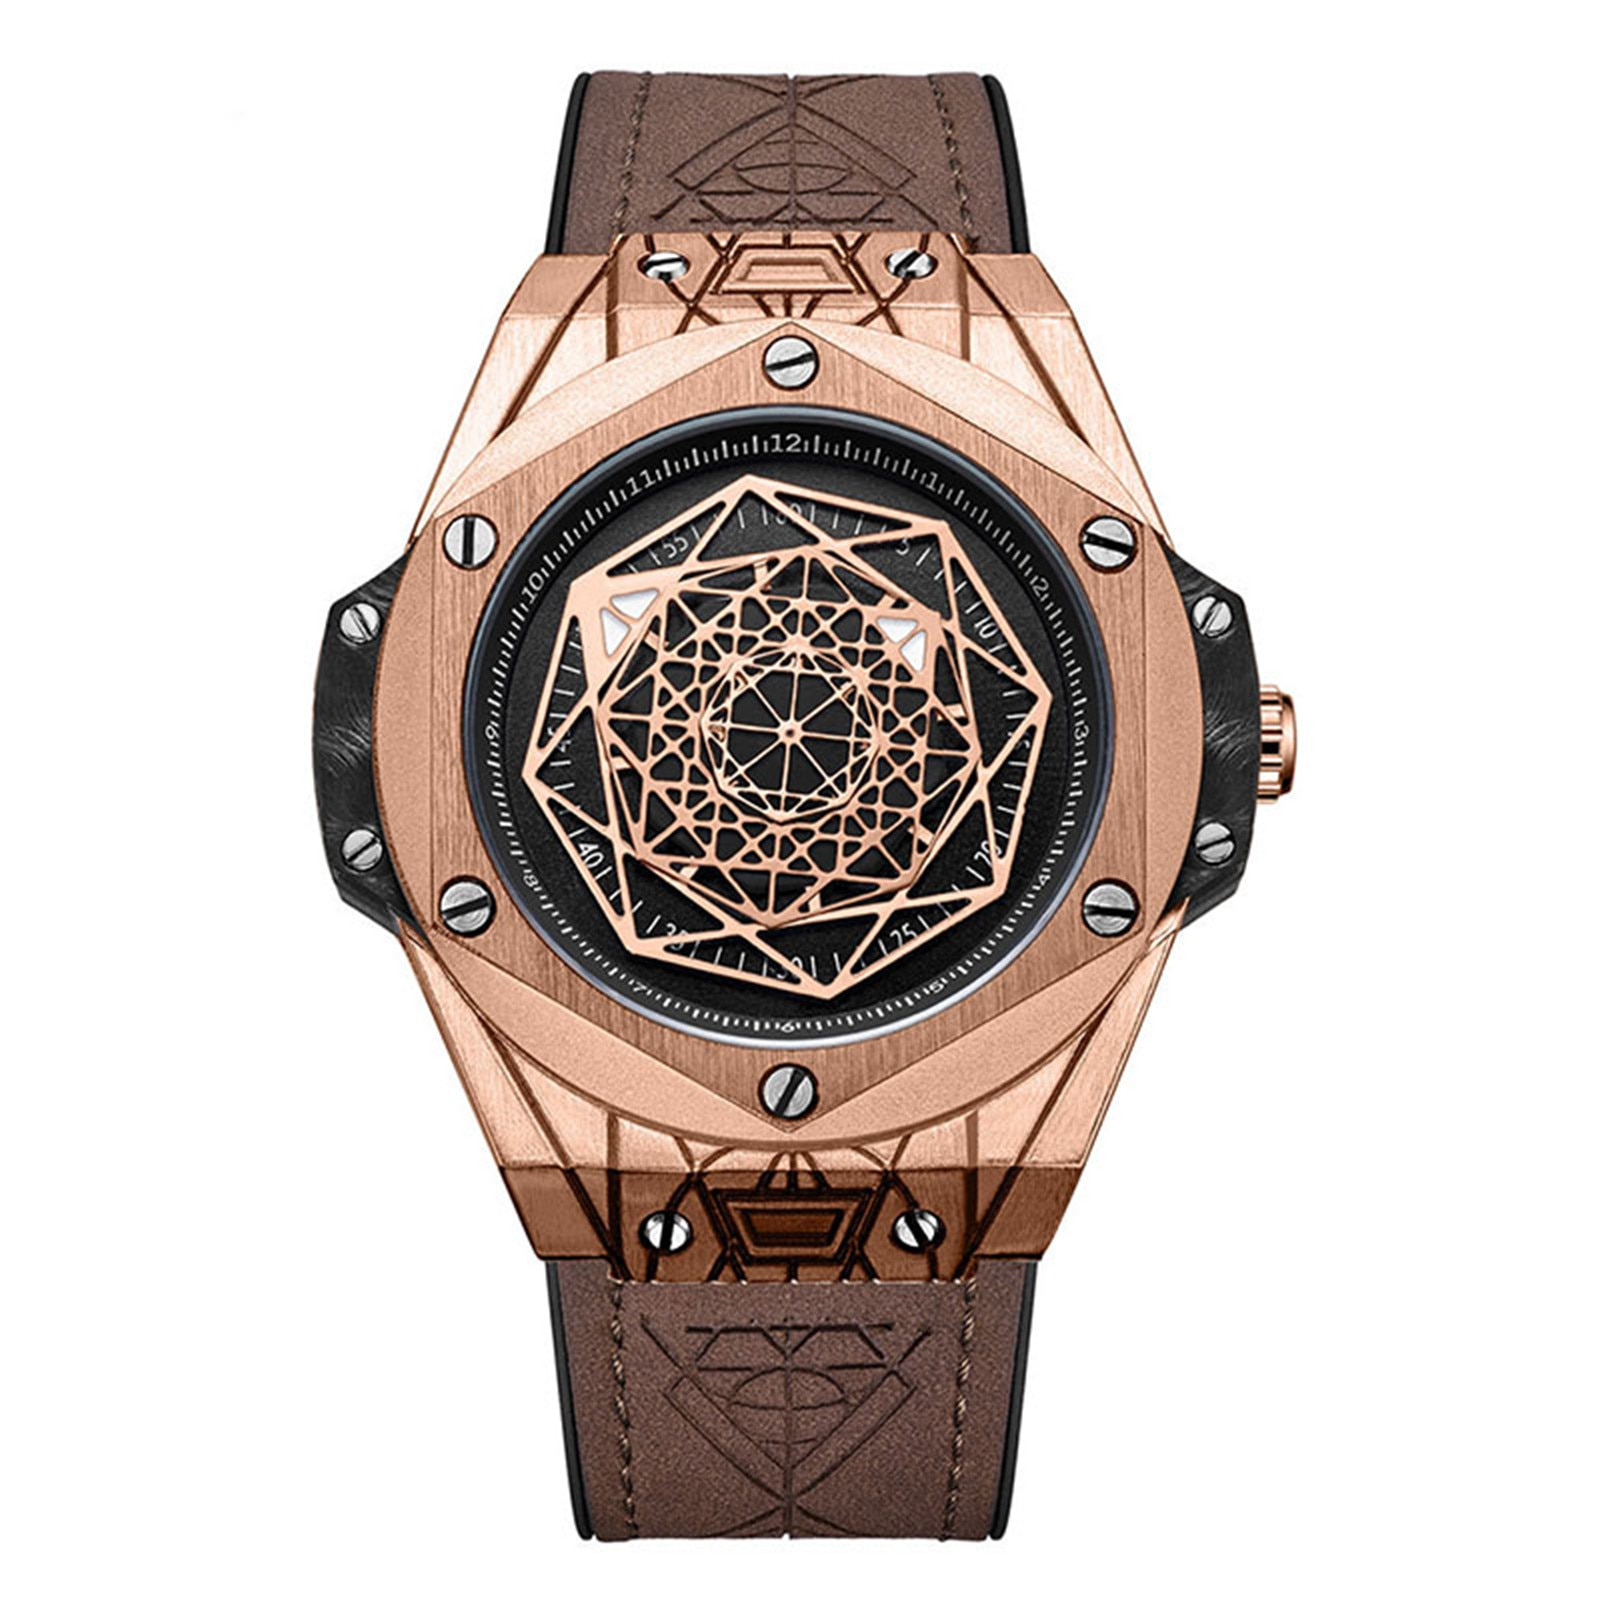 Exquisite Gentleman Geometry Identity Personalized Quartz Watch Waterproof Fashion Glass Mirror Round Dial H9